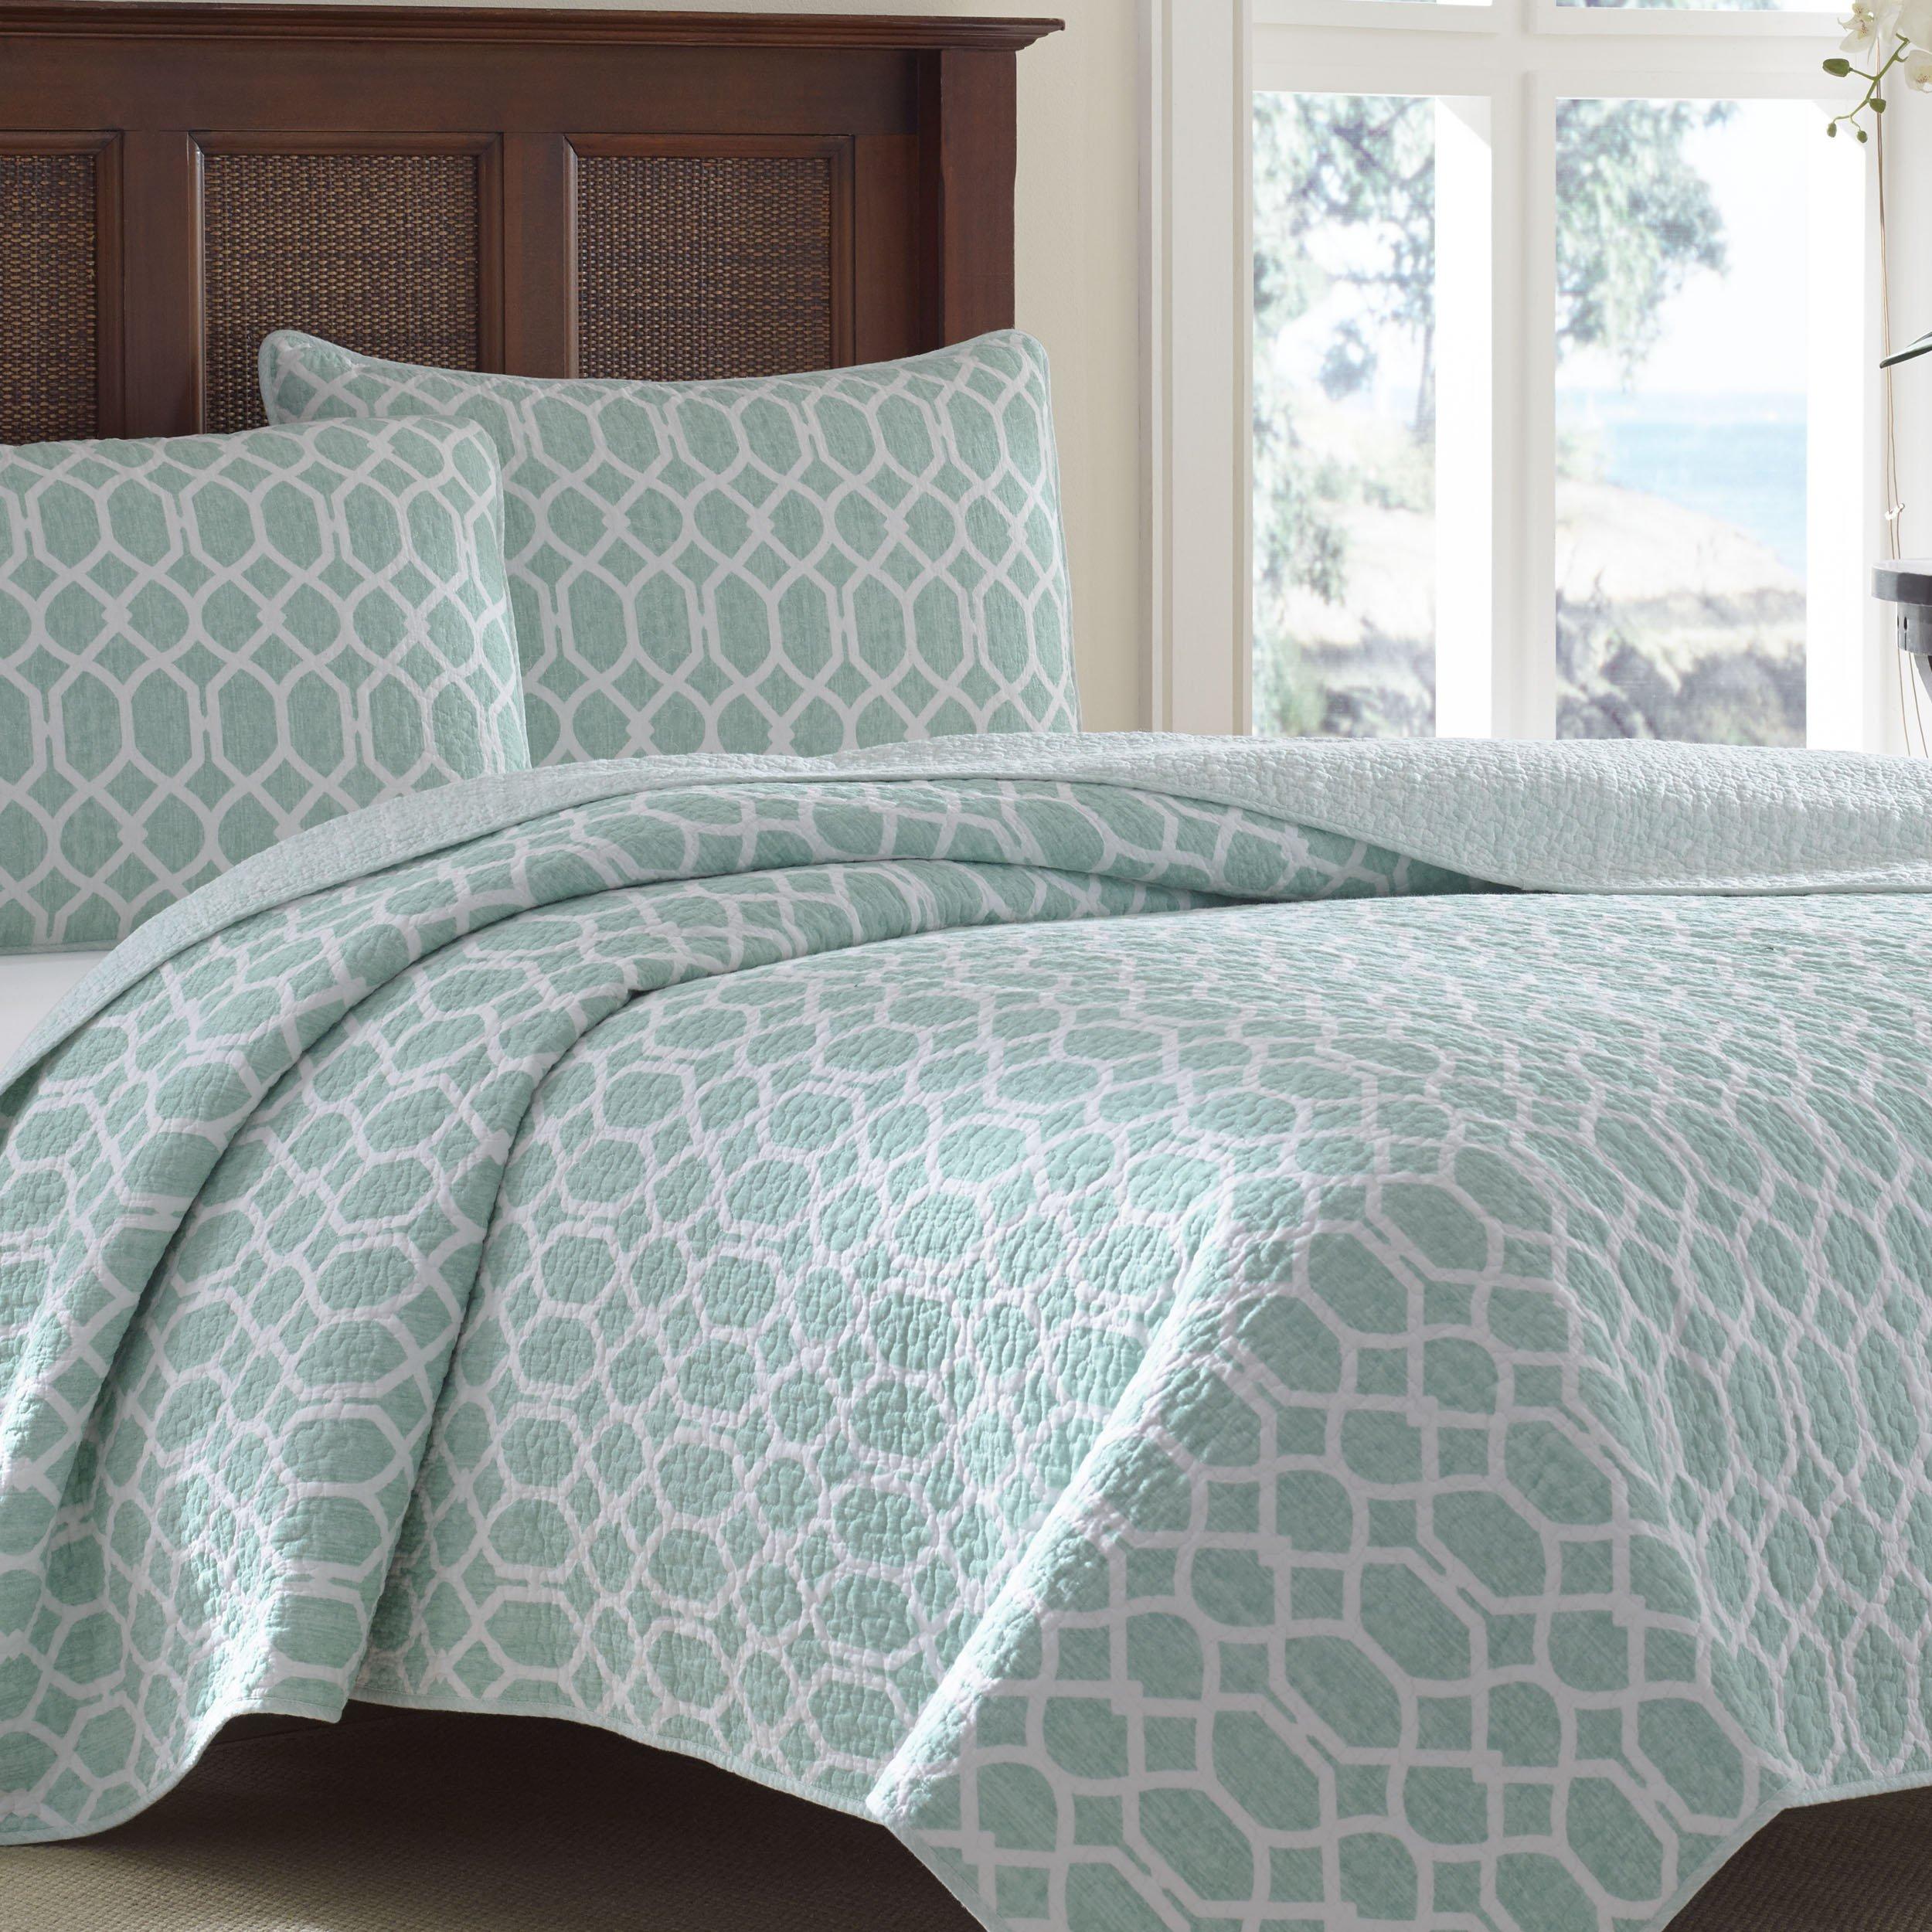 Tommy Bahama Catalina Trellis Harbor Reversible Quilt, Full/Queen, Blue